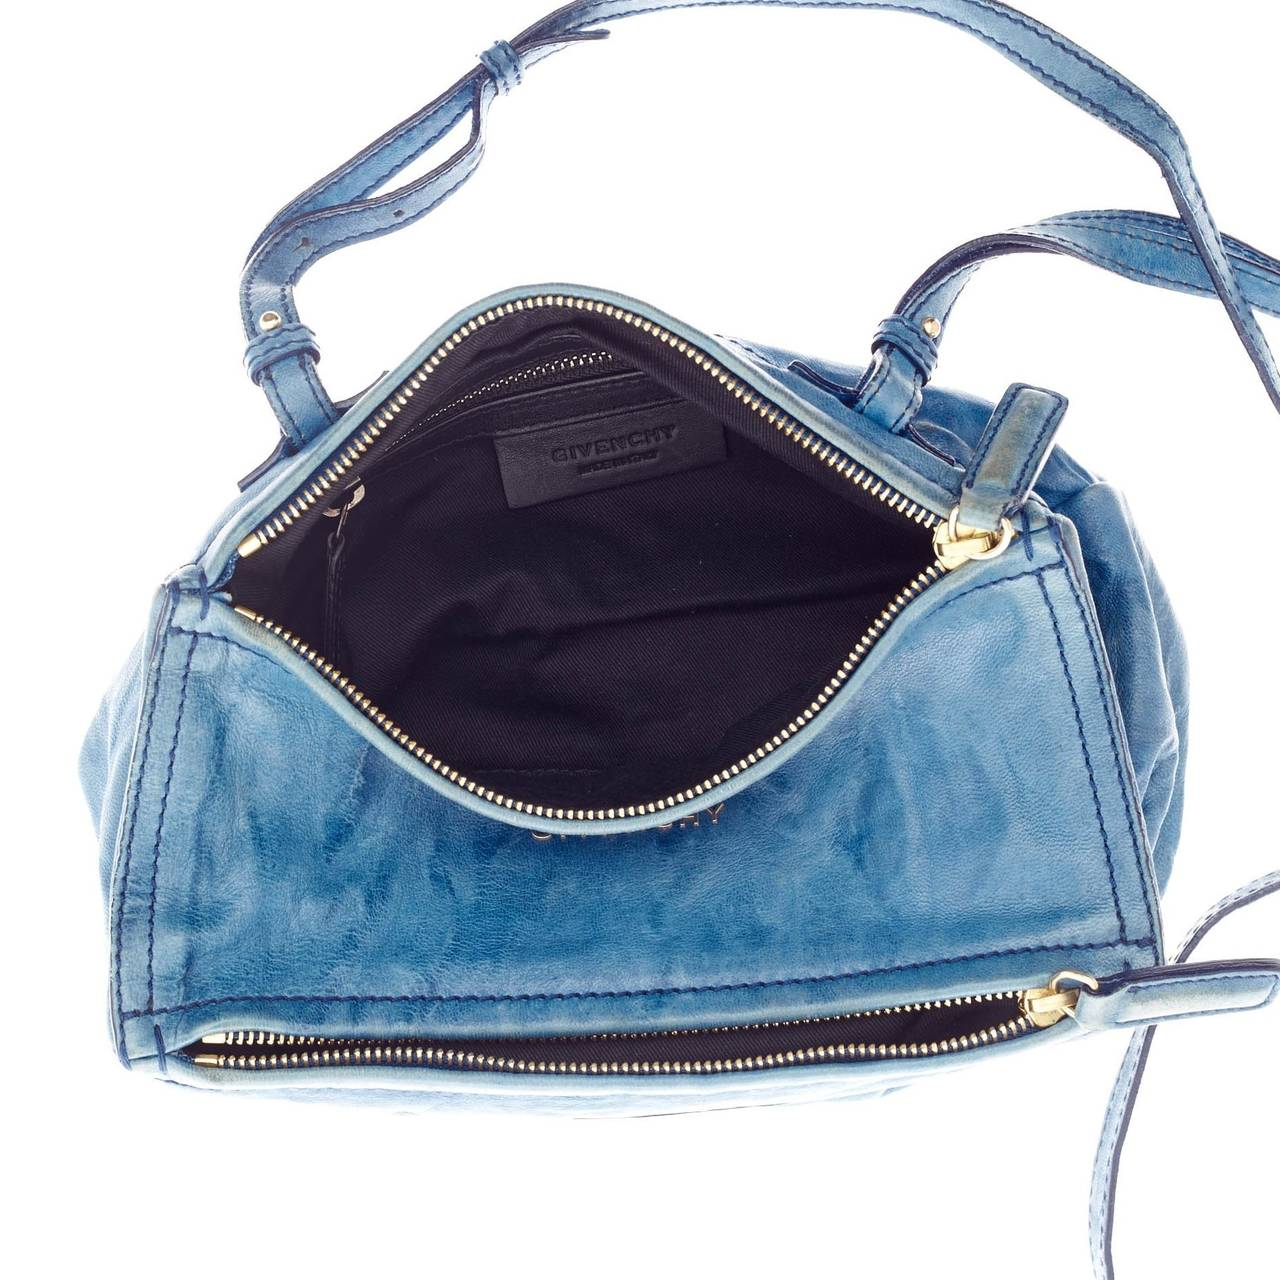 Givenchy Pandora Bag Leather Mini 6